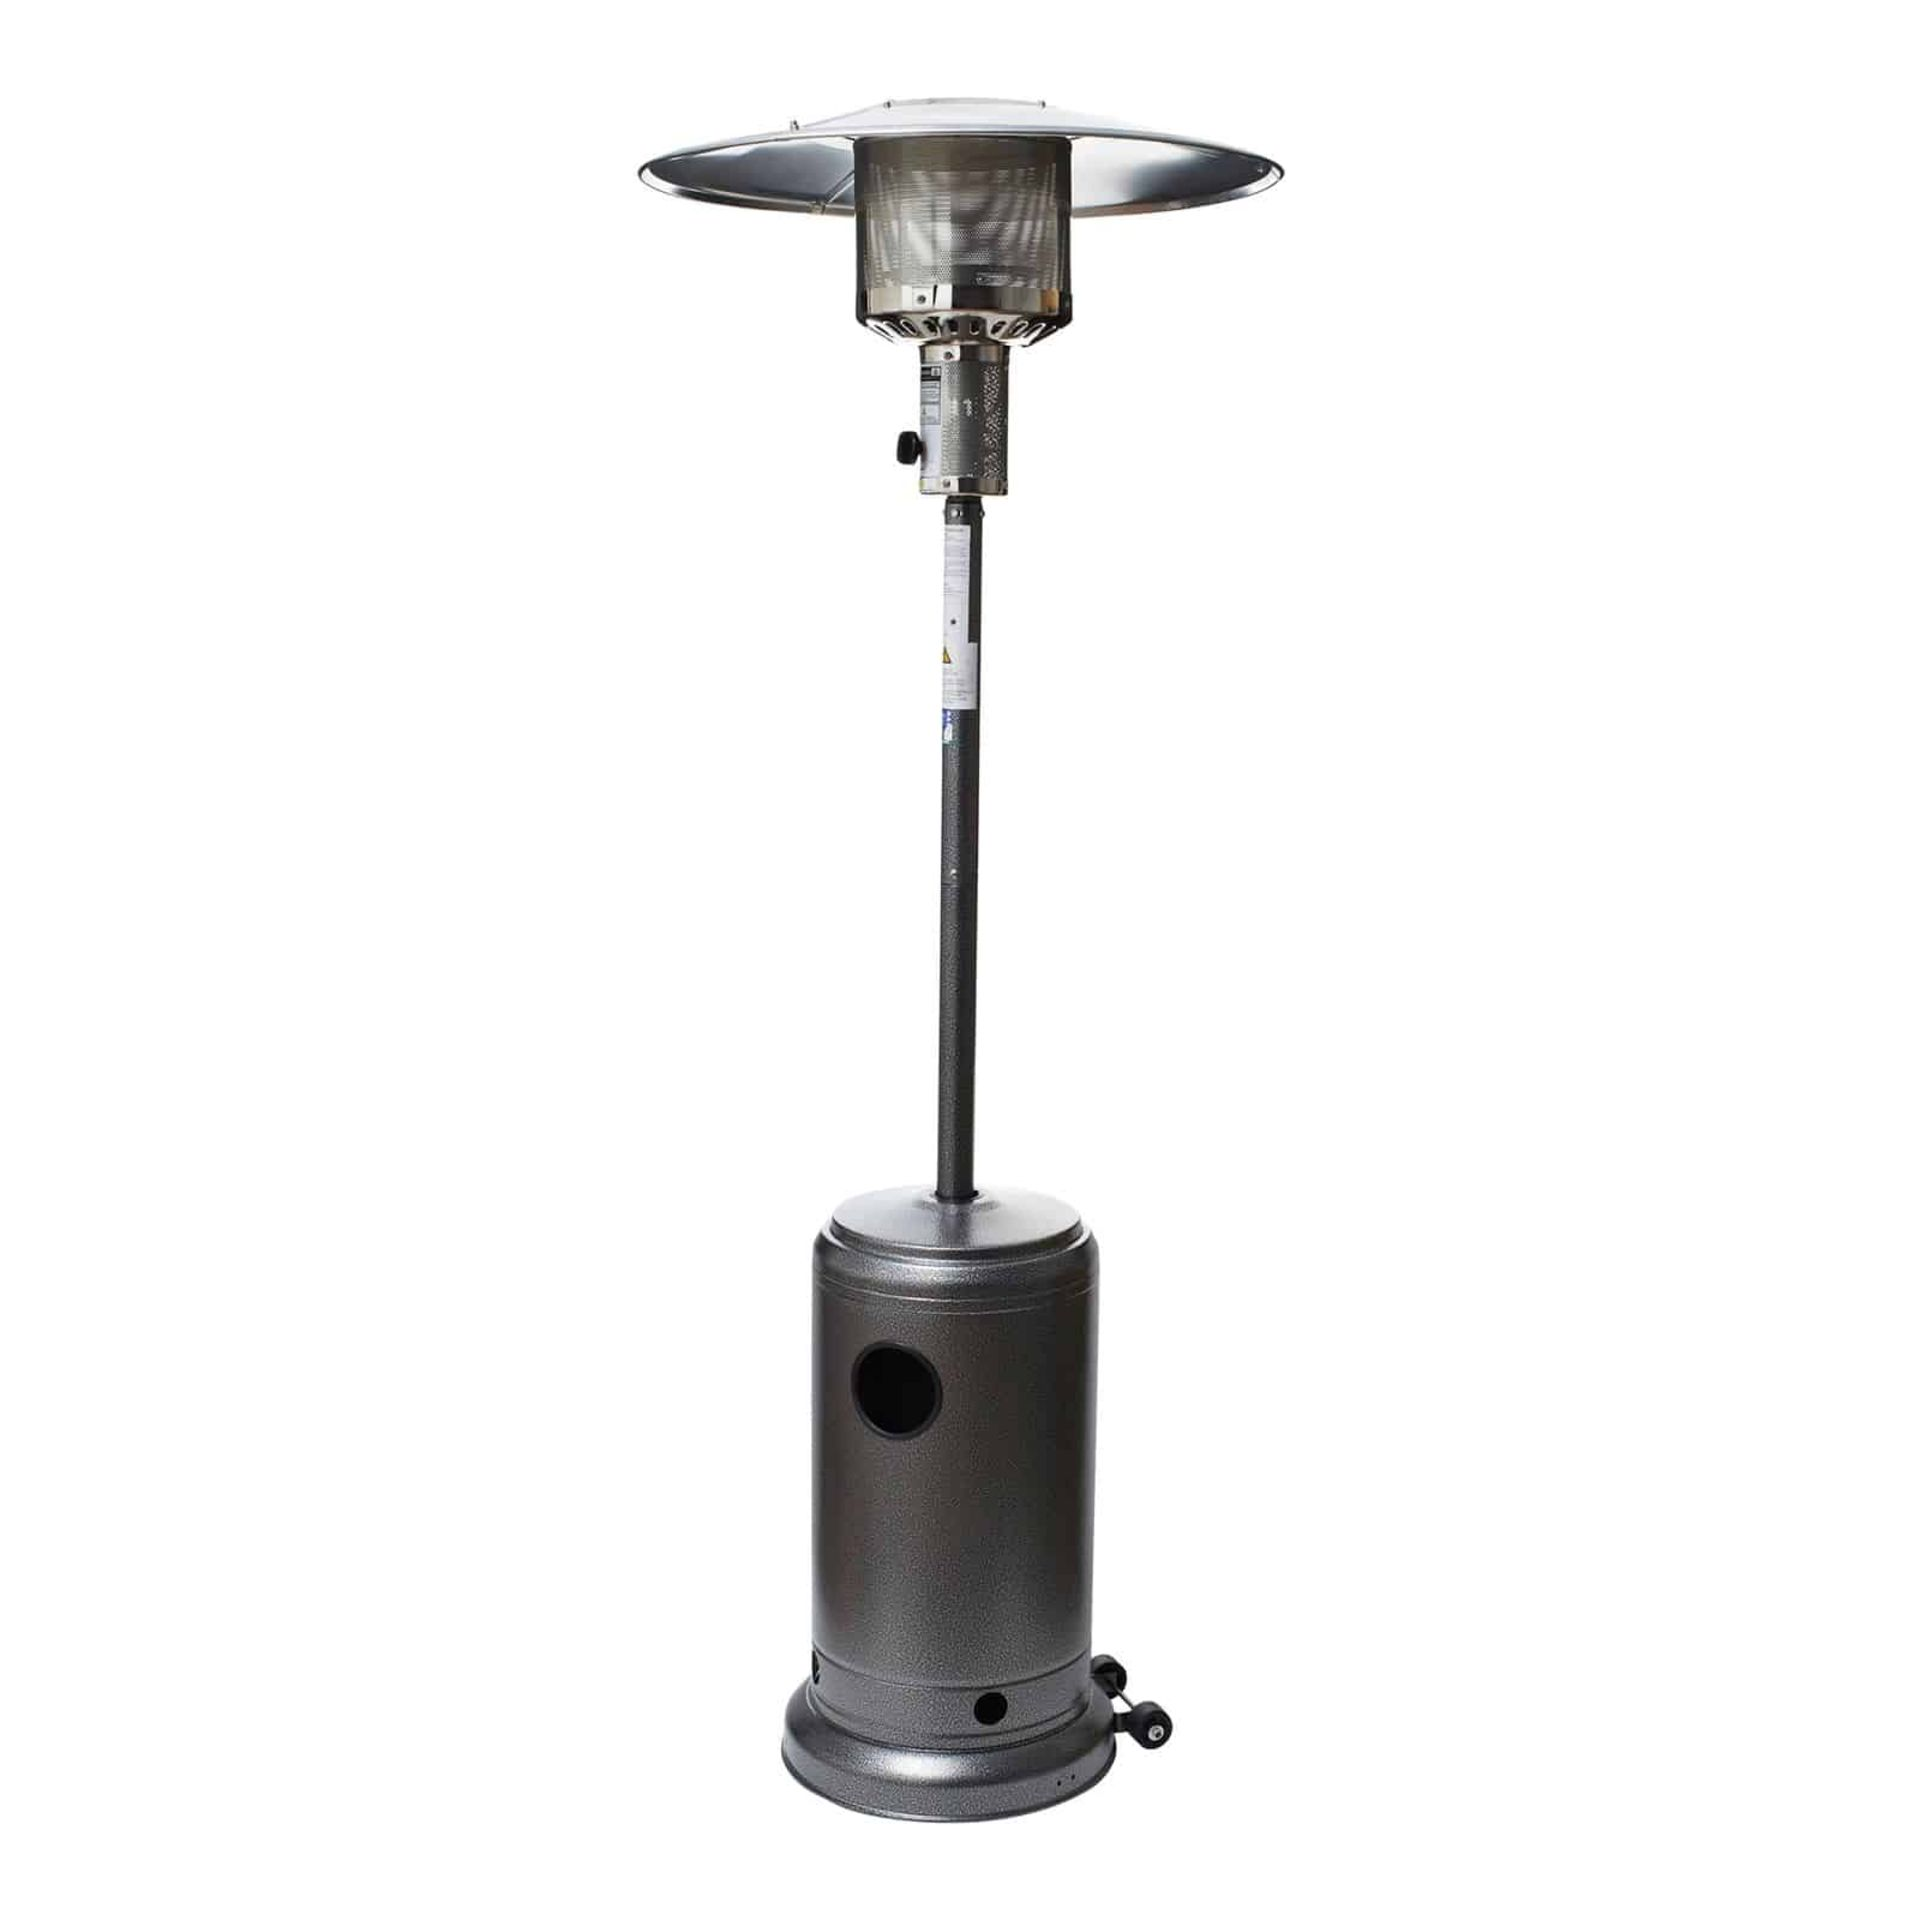 Lot 54 - Top Hat Patio Heater